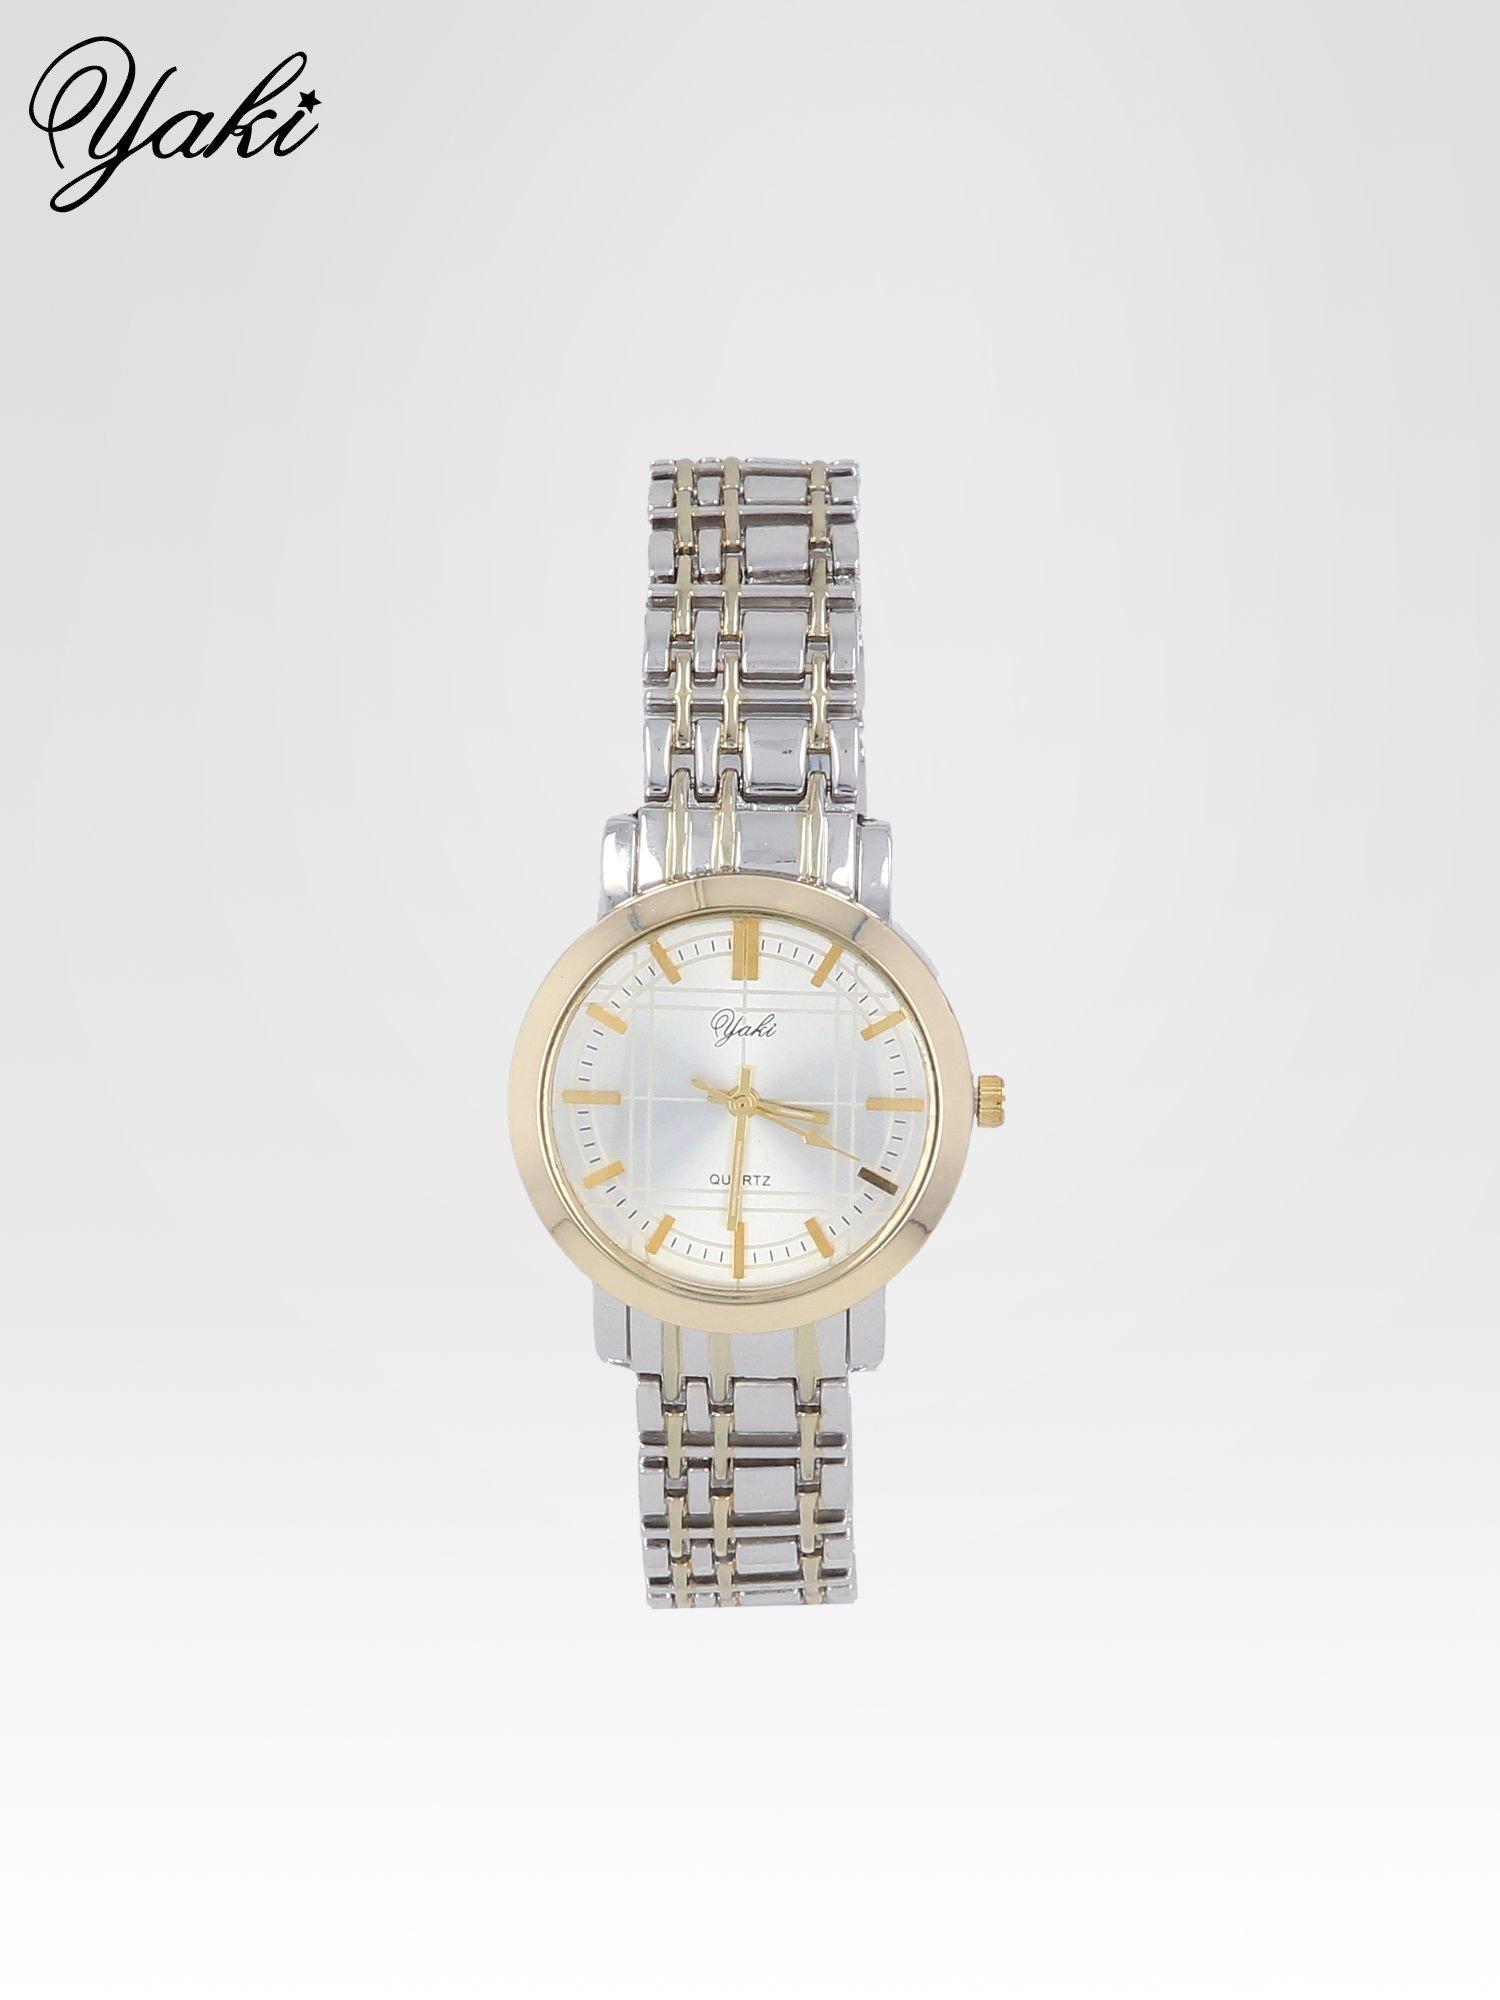 Srebrny klasyczny zegarek damski na bransolecie                                  zdj.                                  1